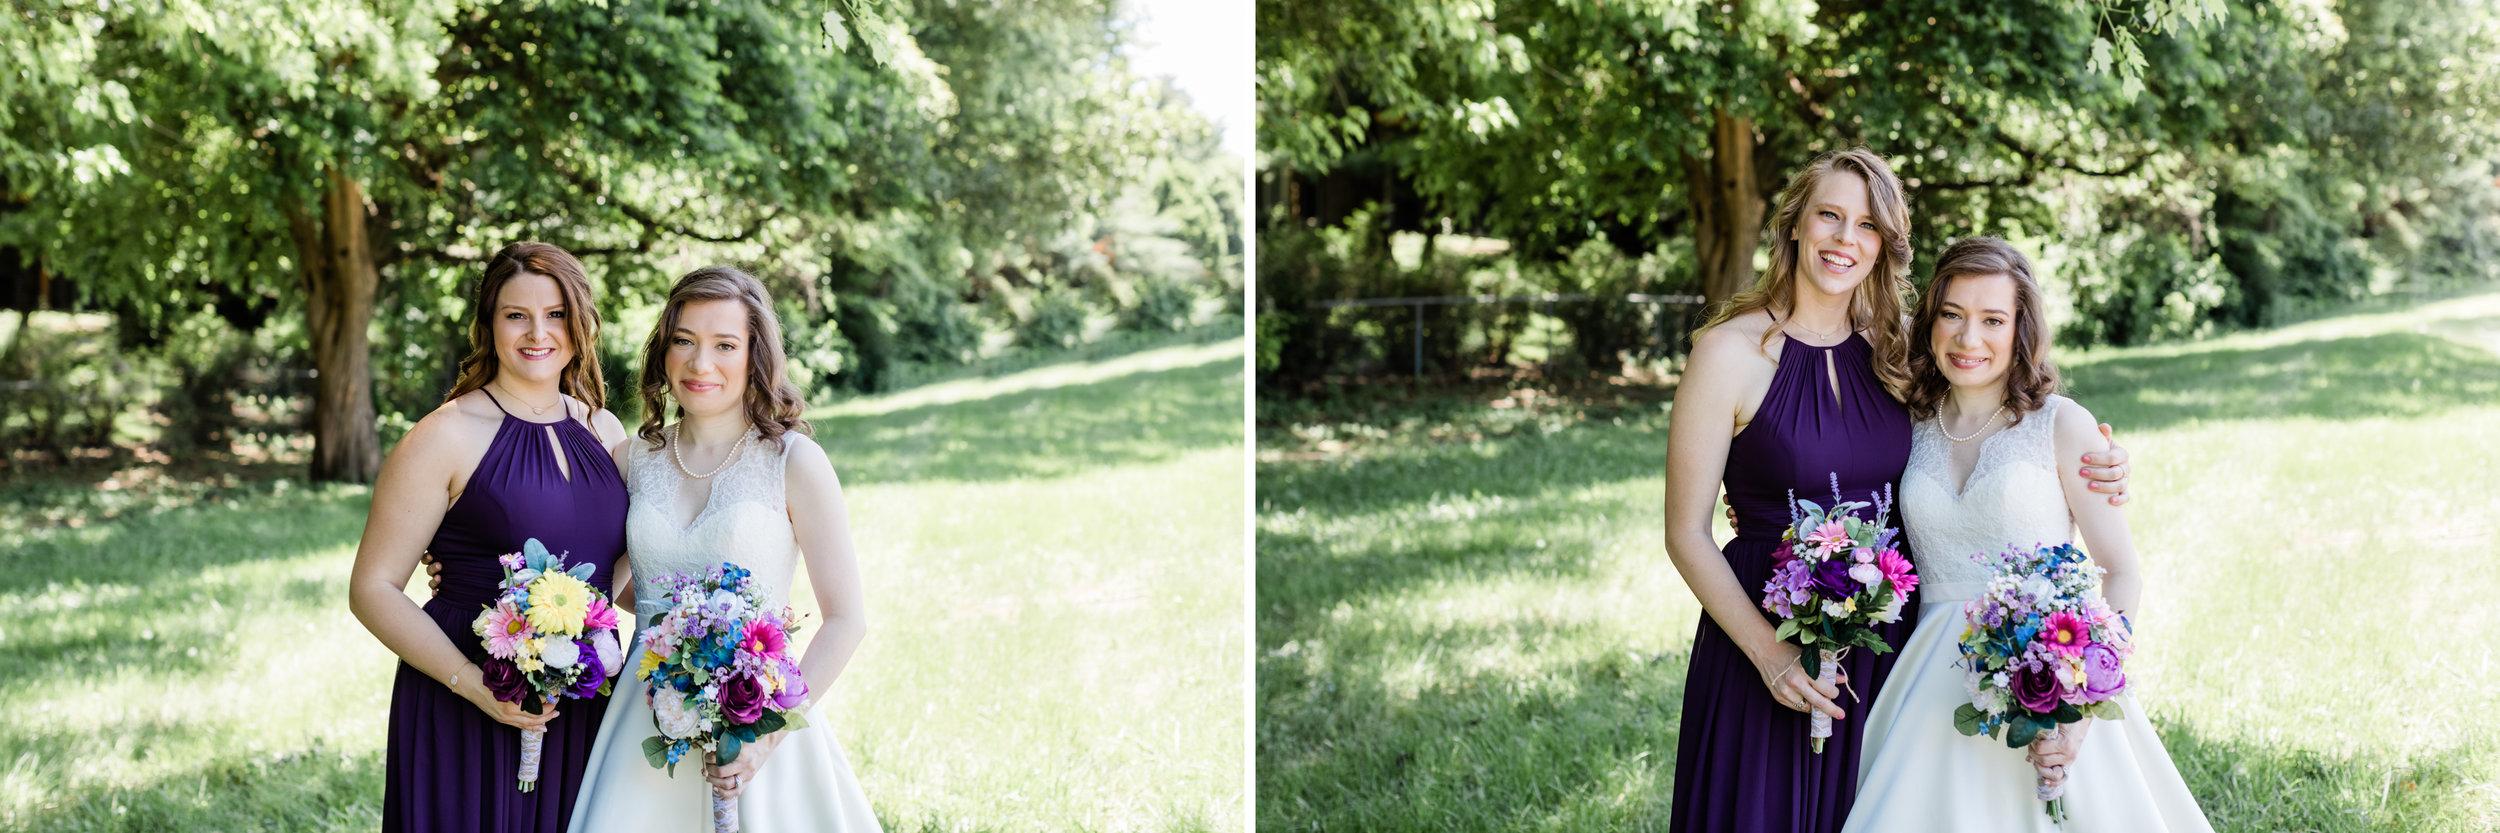 kansas city wedding photographer 2.jpg